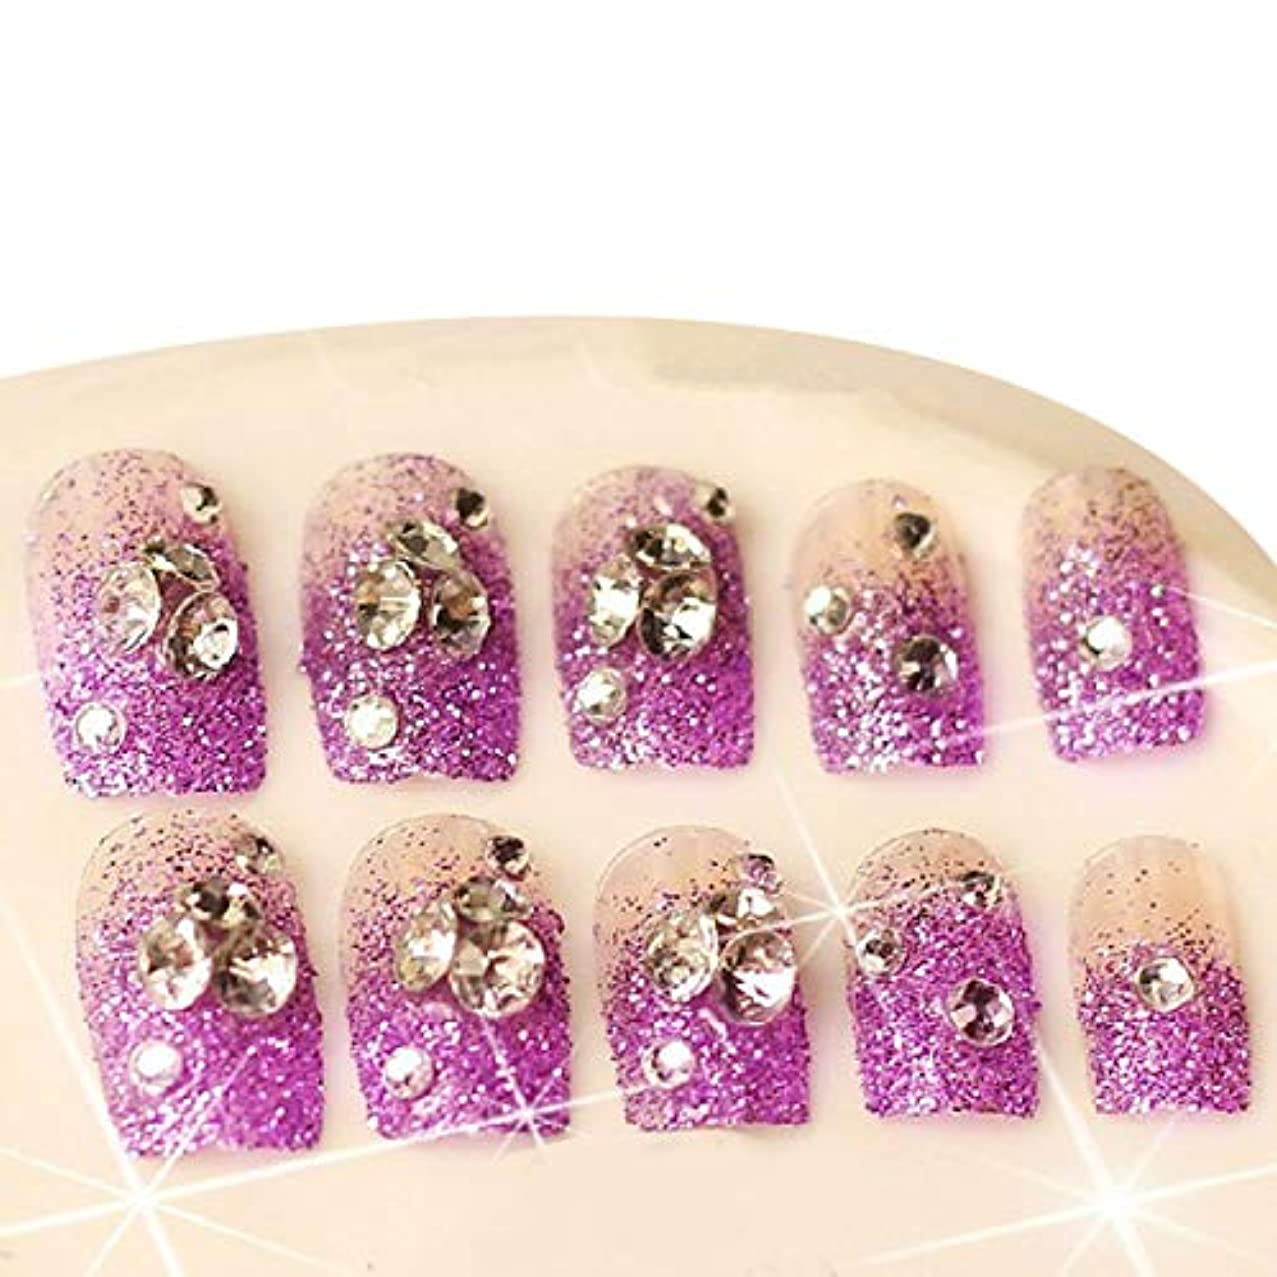 Frcolor ネイルシール ネイルステッカー 人気 星 パープル グリッターのダイヤモンド 分解可能 花嫁 24枚セット